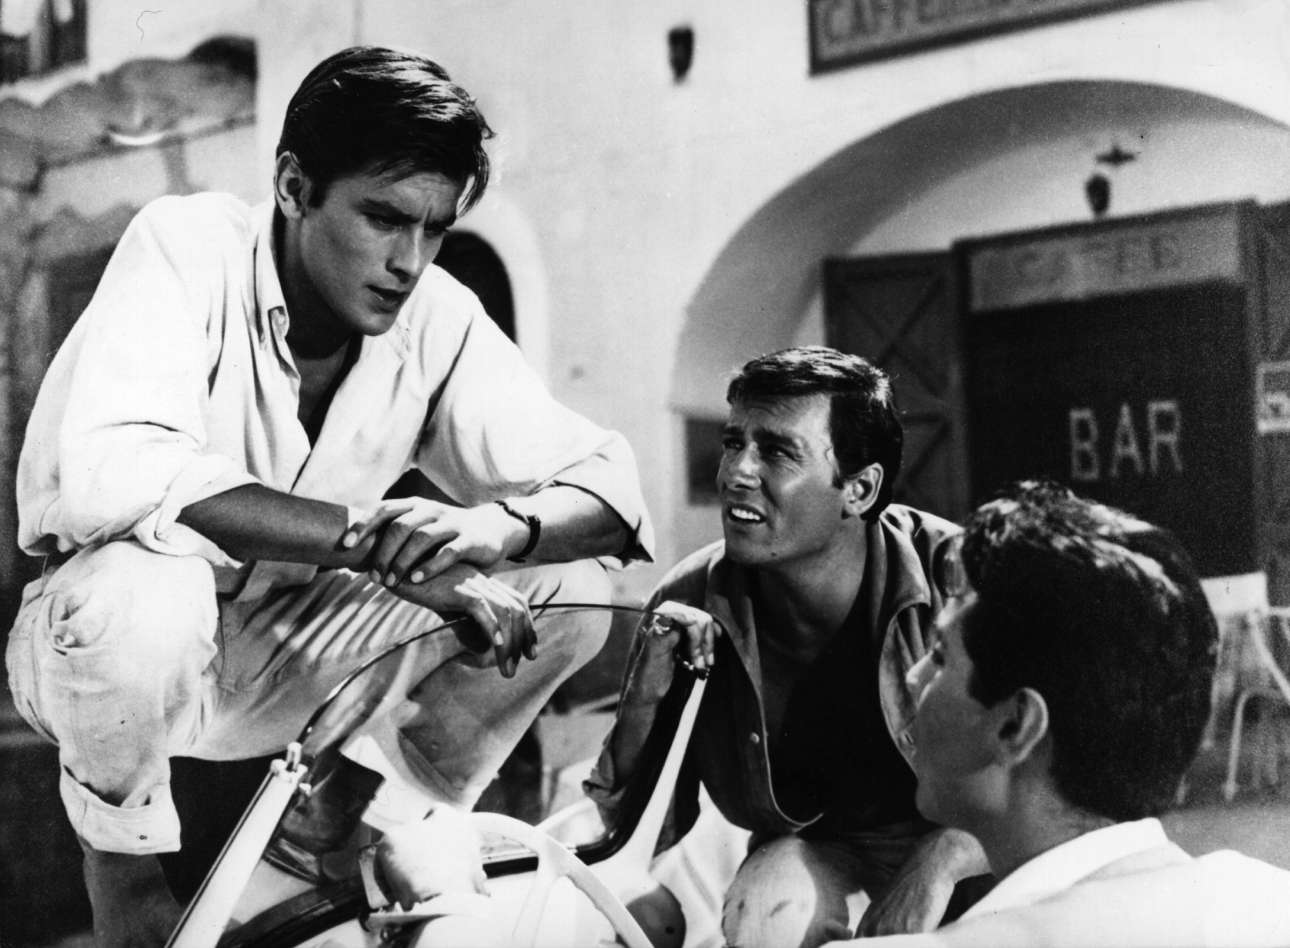 O Αλέν Ντελόν με τον Μορίς Ρονέ (στο μέσον) στο «Γυμνοί στον Ηλιο» (1960) του Ρενέ Κλεμάν